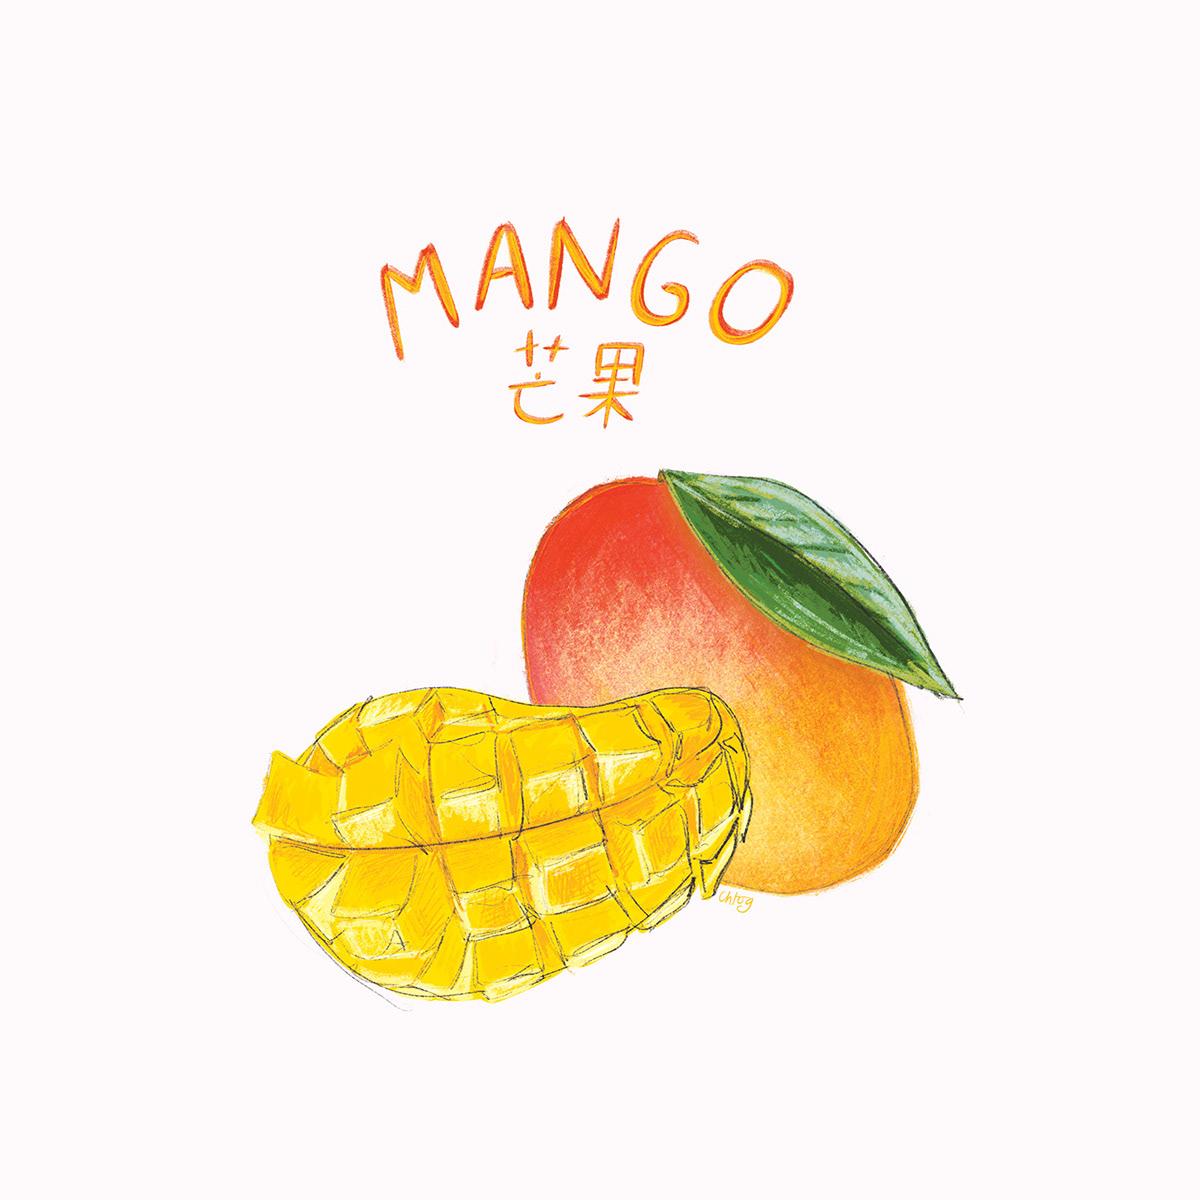 Taiwan Fruits - Digital Illustrations on Behance